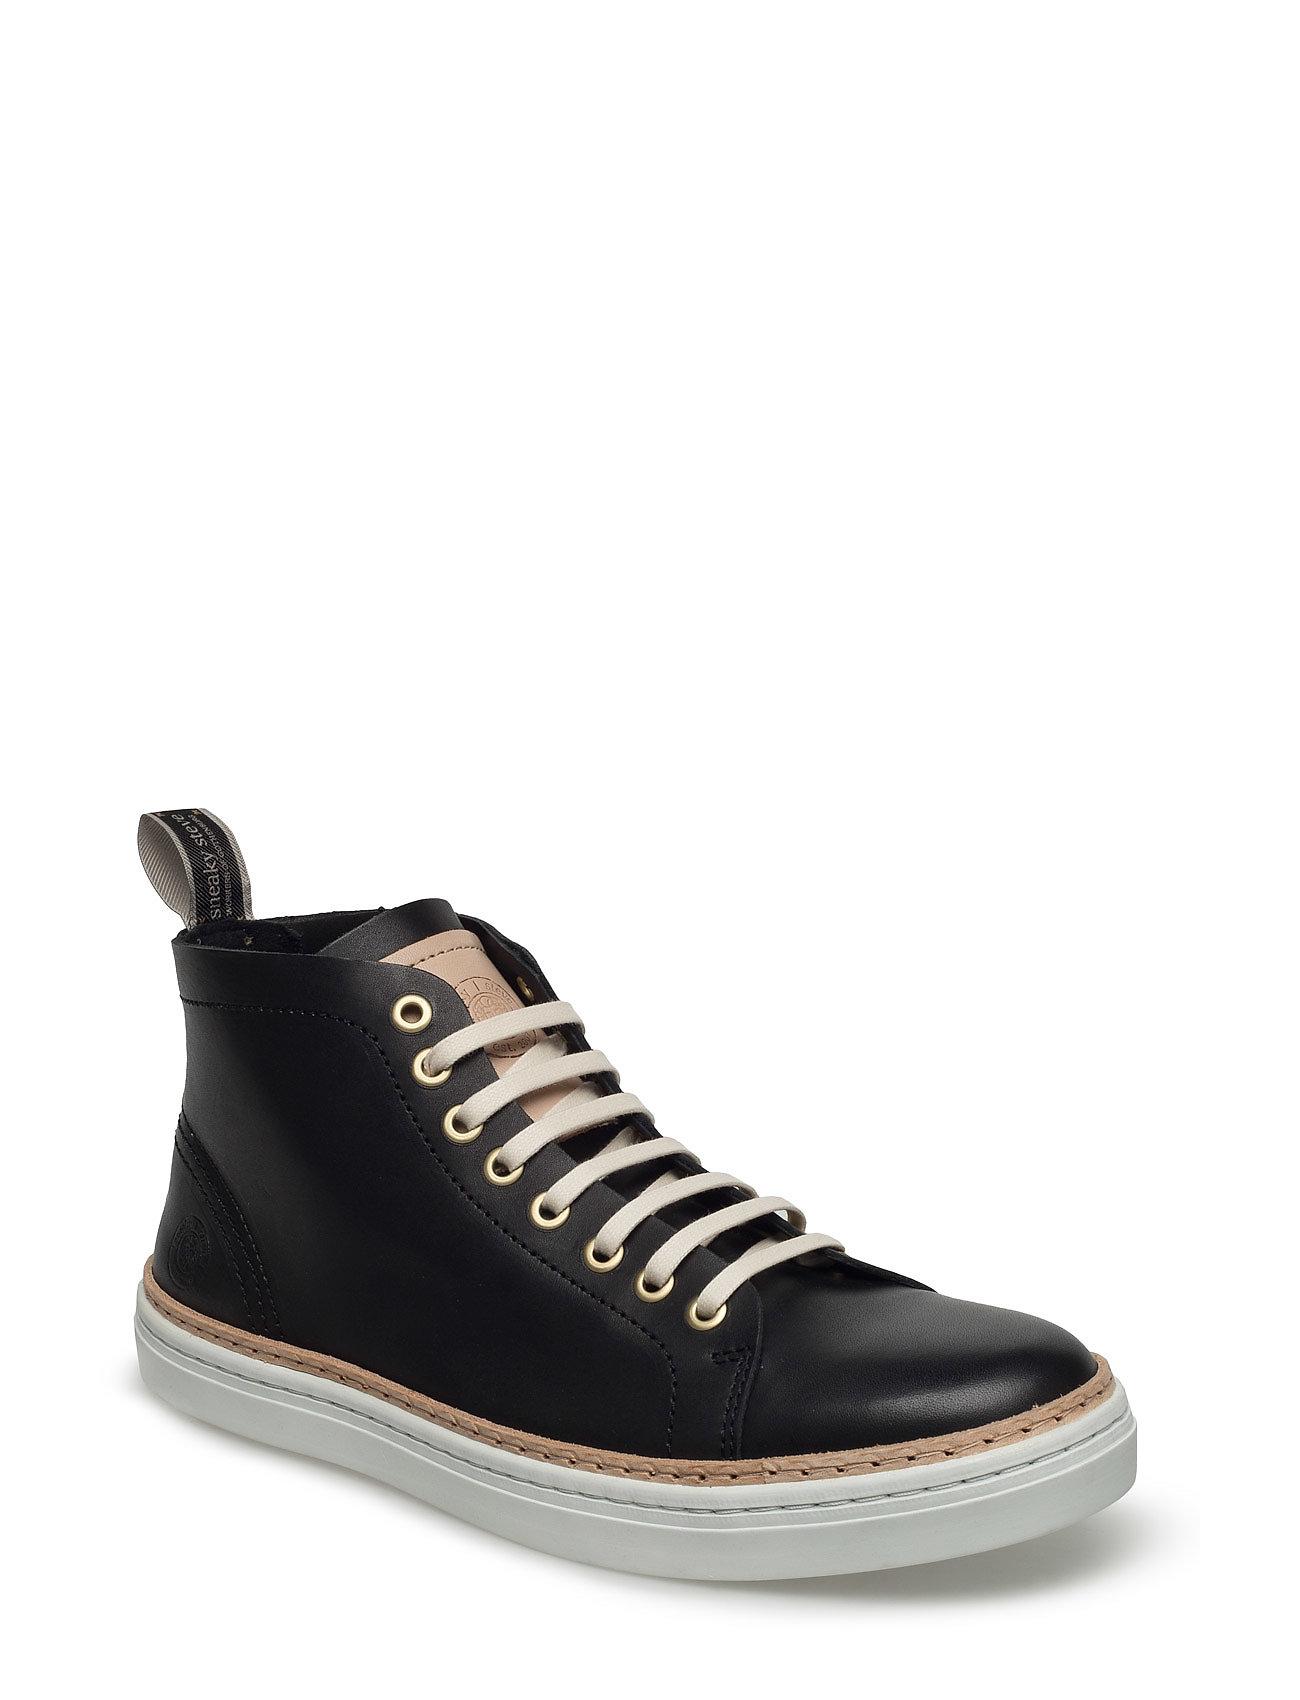 Silvermine High Sneaky Steve Sneakers til Herrer i Sort